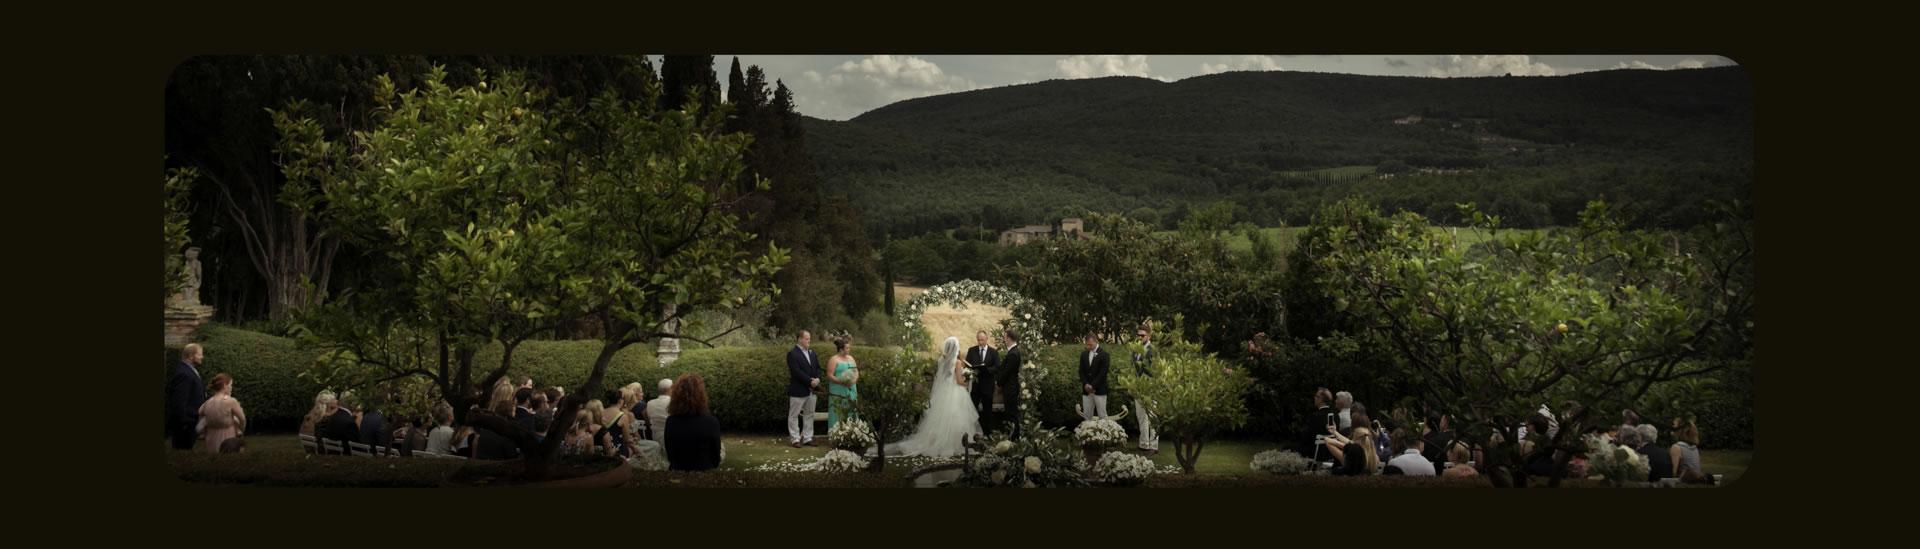 borgo-stomennano-david-bastianoni-photographer-00023 - 23 :: Wedding at Borgo Stomennano // WPPI 2018 // Our love is here to stay :: Luxury wedding photography - 22 :: borgo-stomennano-david-bastianoni-photographer-00023 - 23